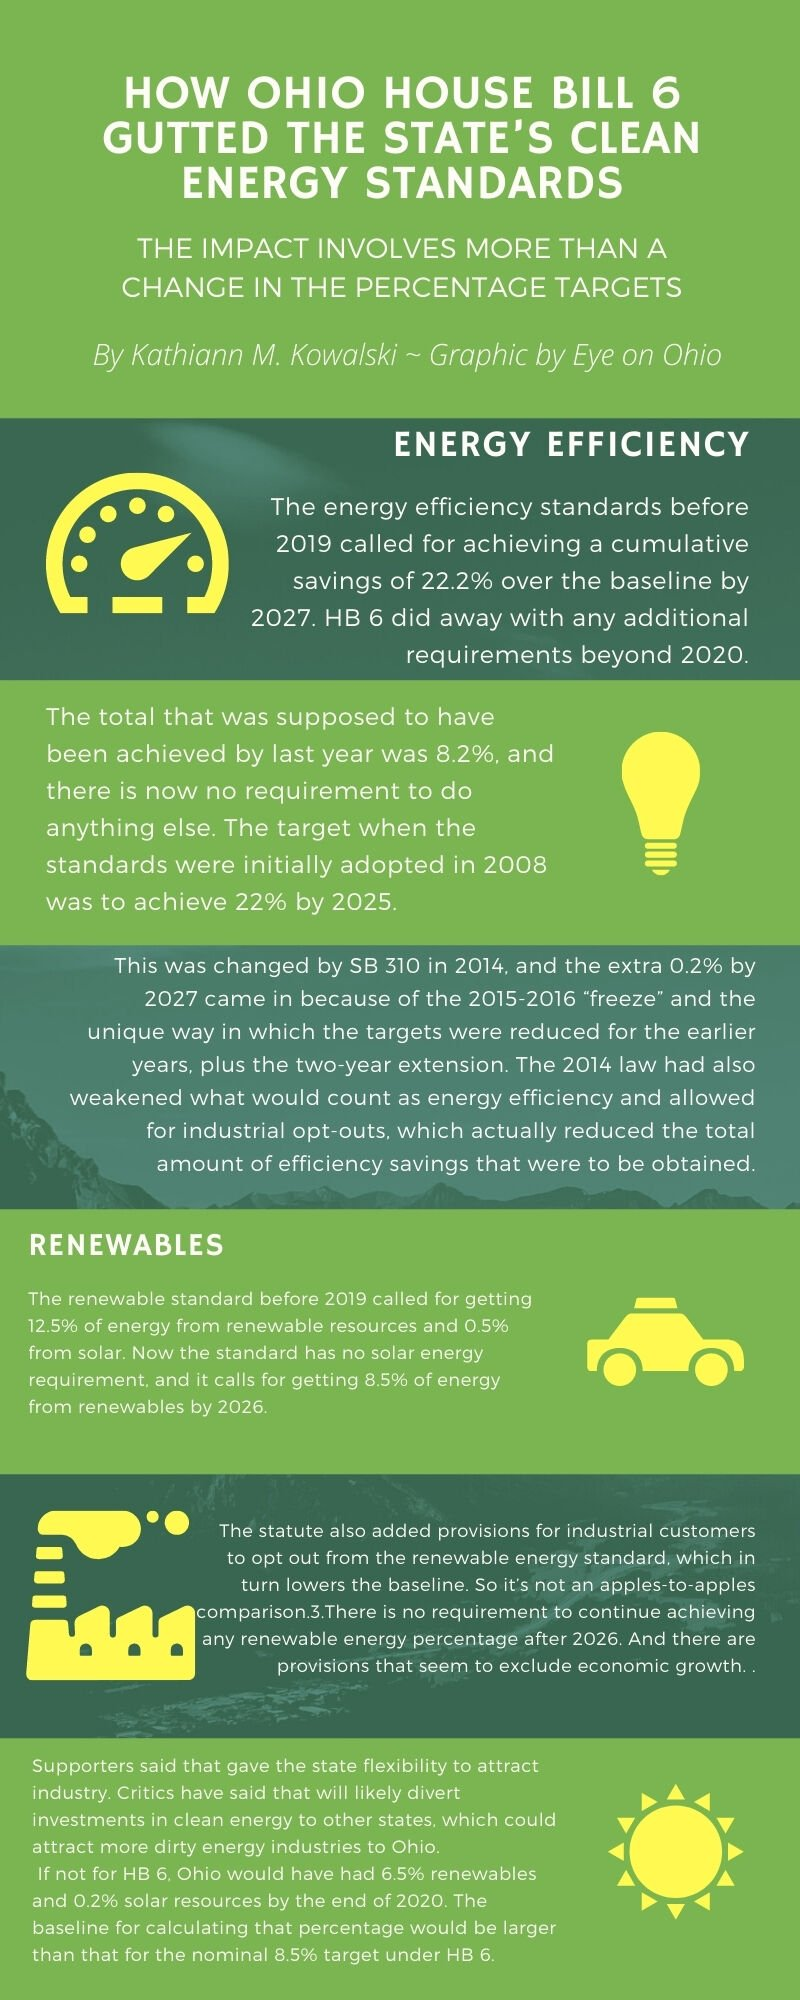 HB6 renewables explainer infographic